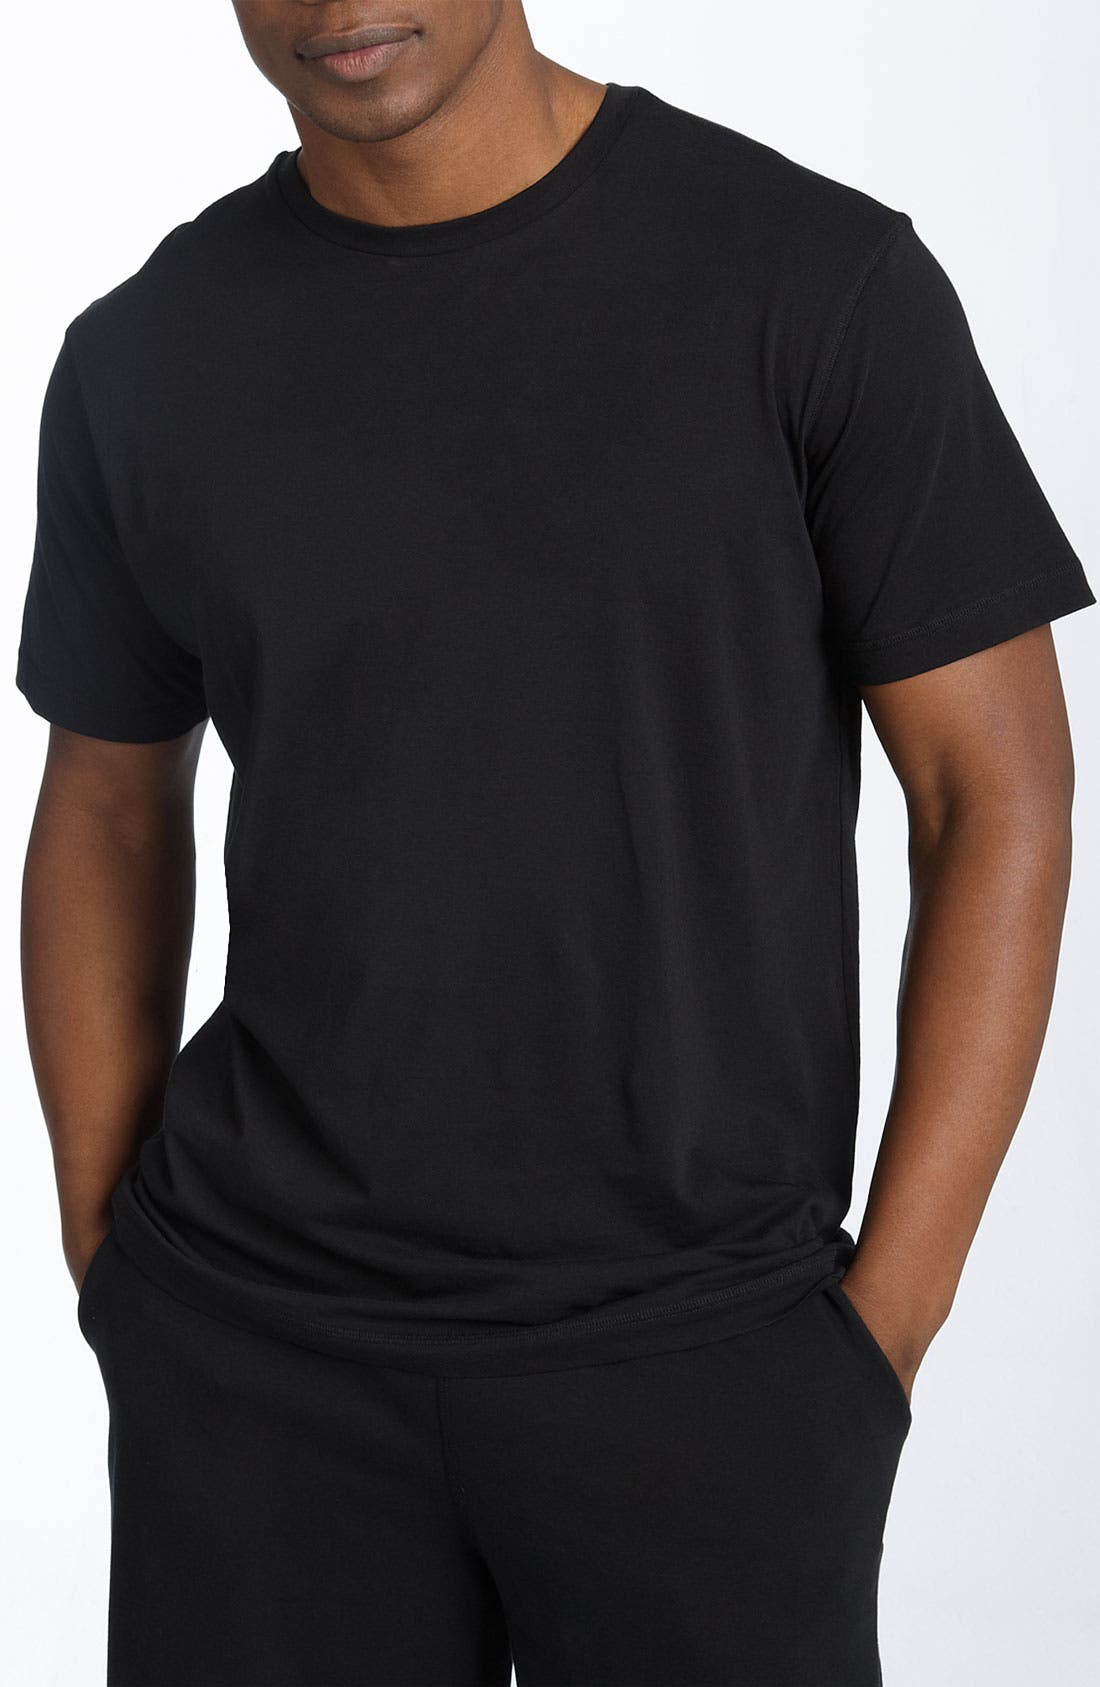 Alternate Image 1 Selected - Daniel Buchler Peruvian Pima Cotton T-Shirt